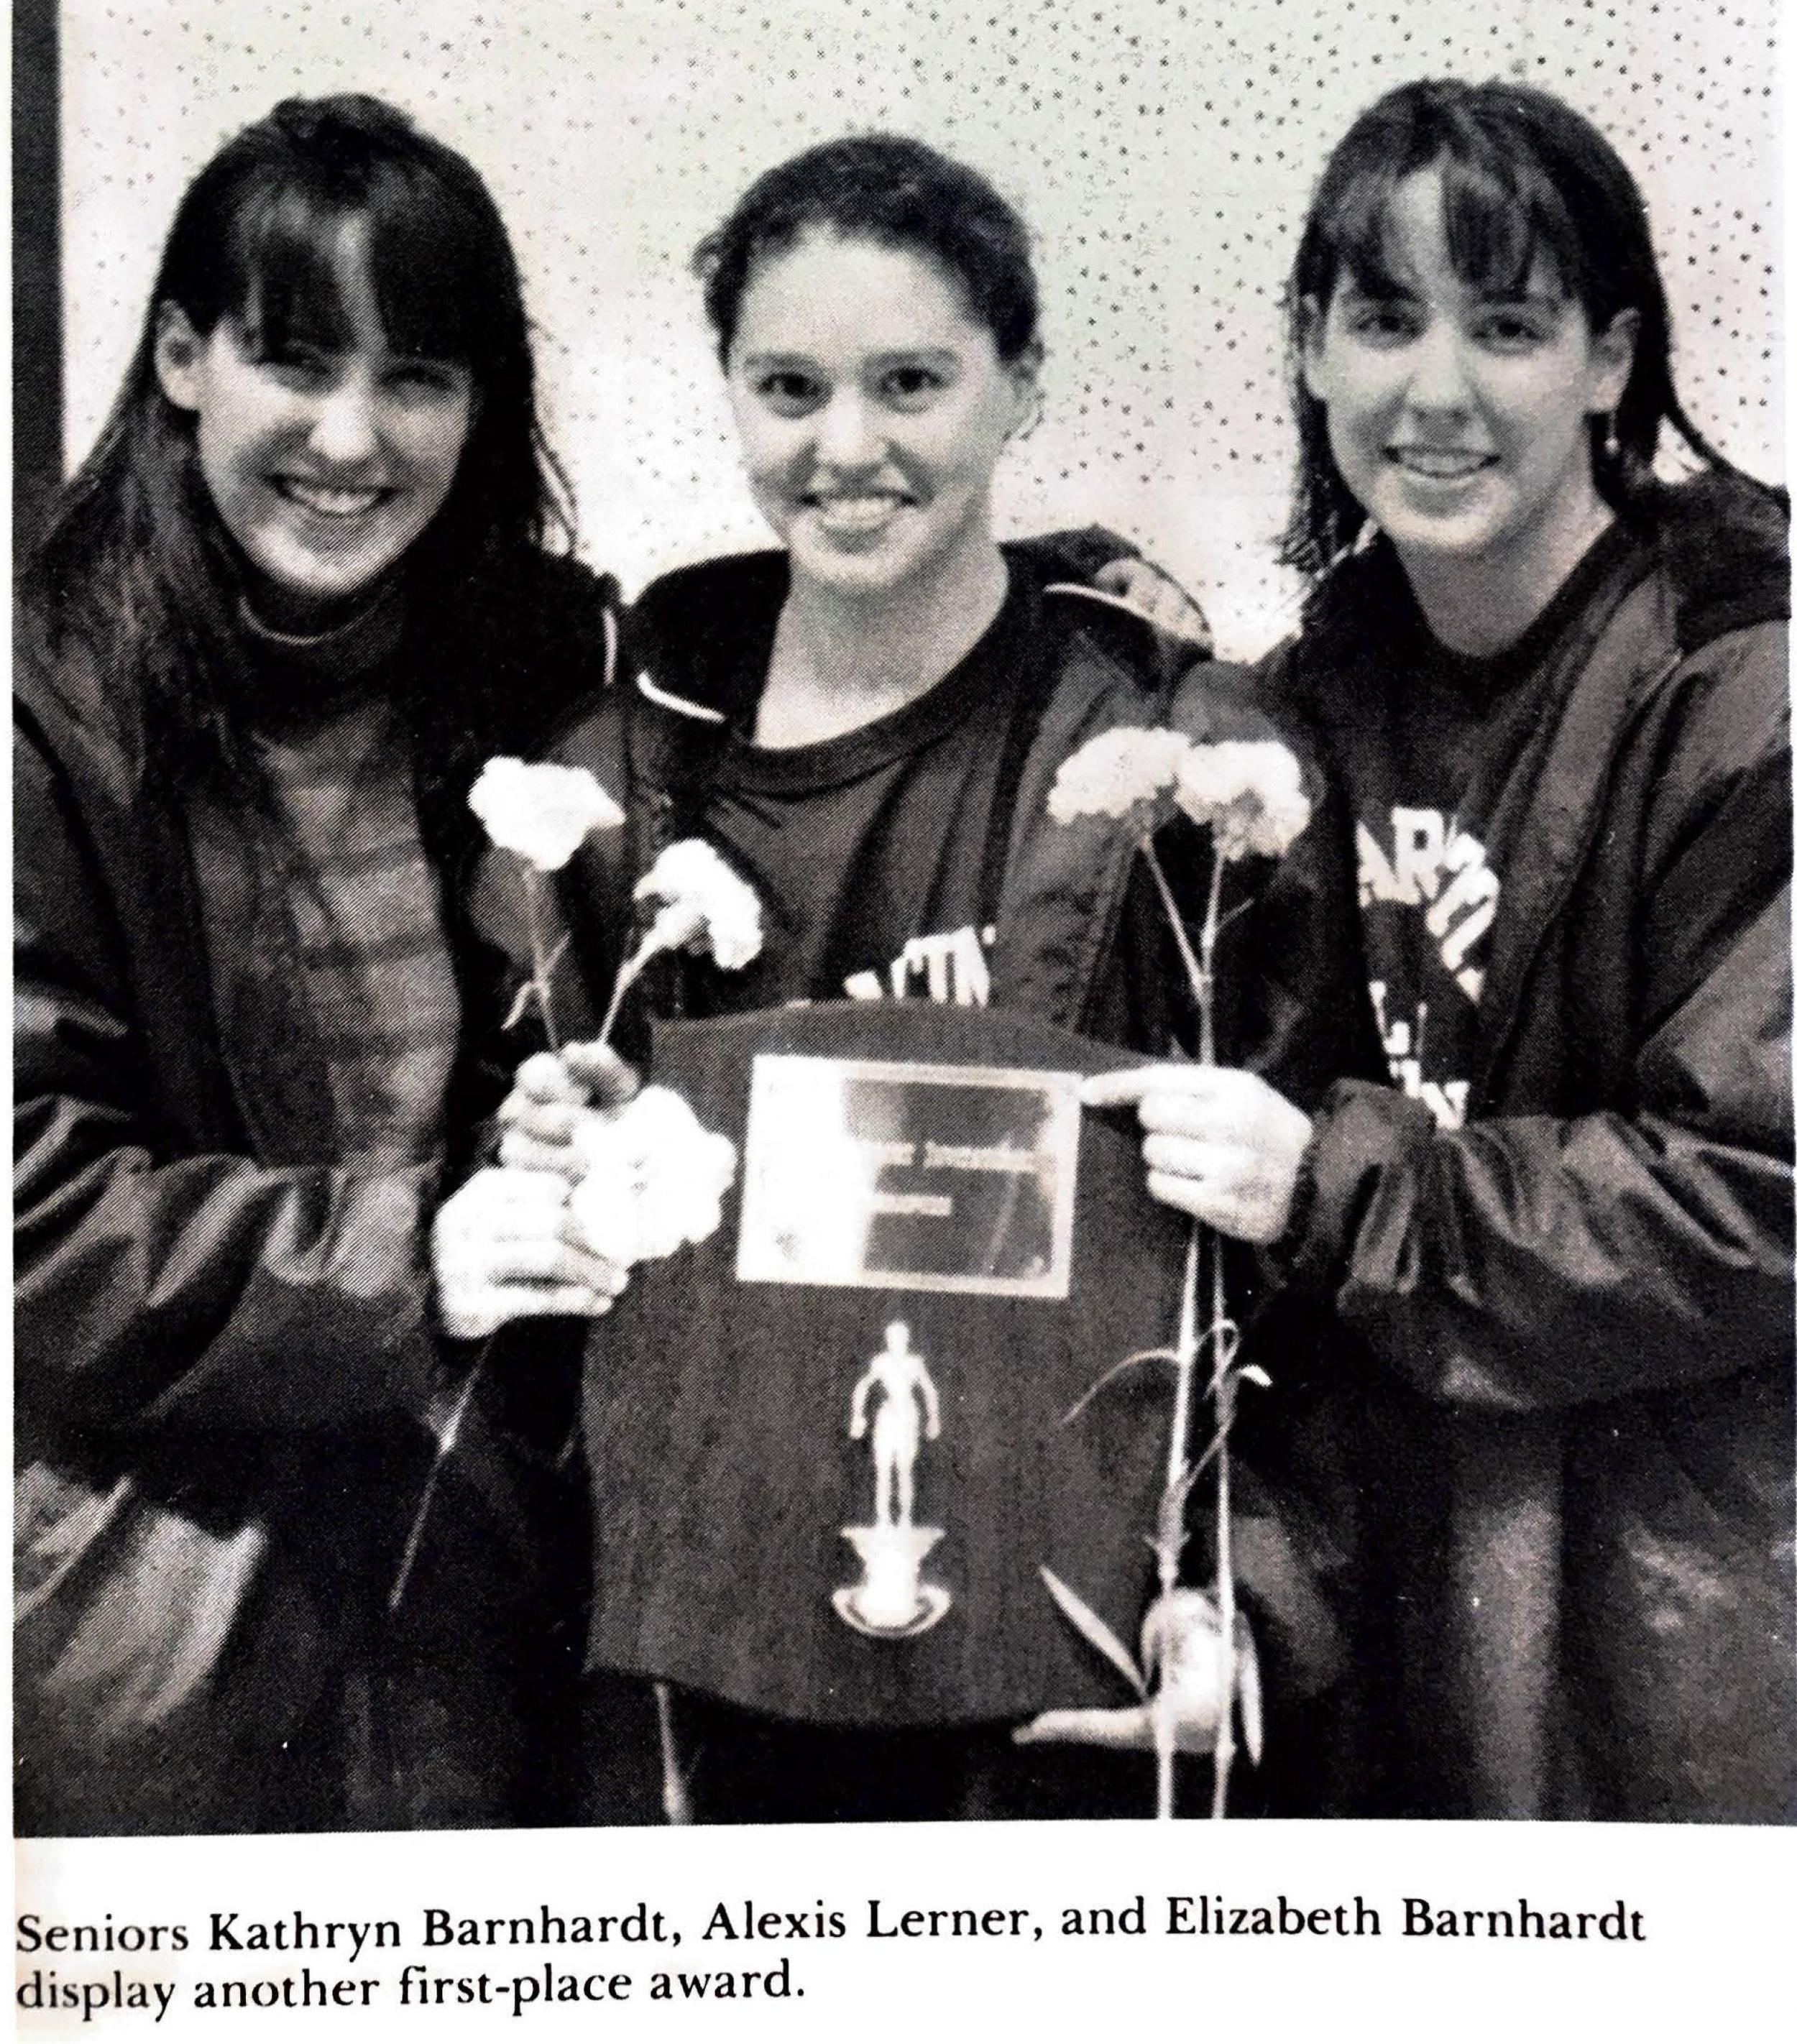 Champion swimmers Kathryn Barnhardt Van Nort '91, Alexis Lerner '91 and Elizabeth Barnhardt '91